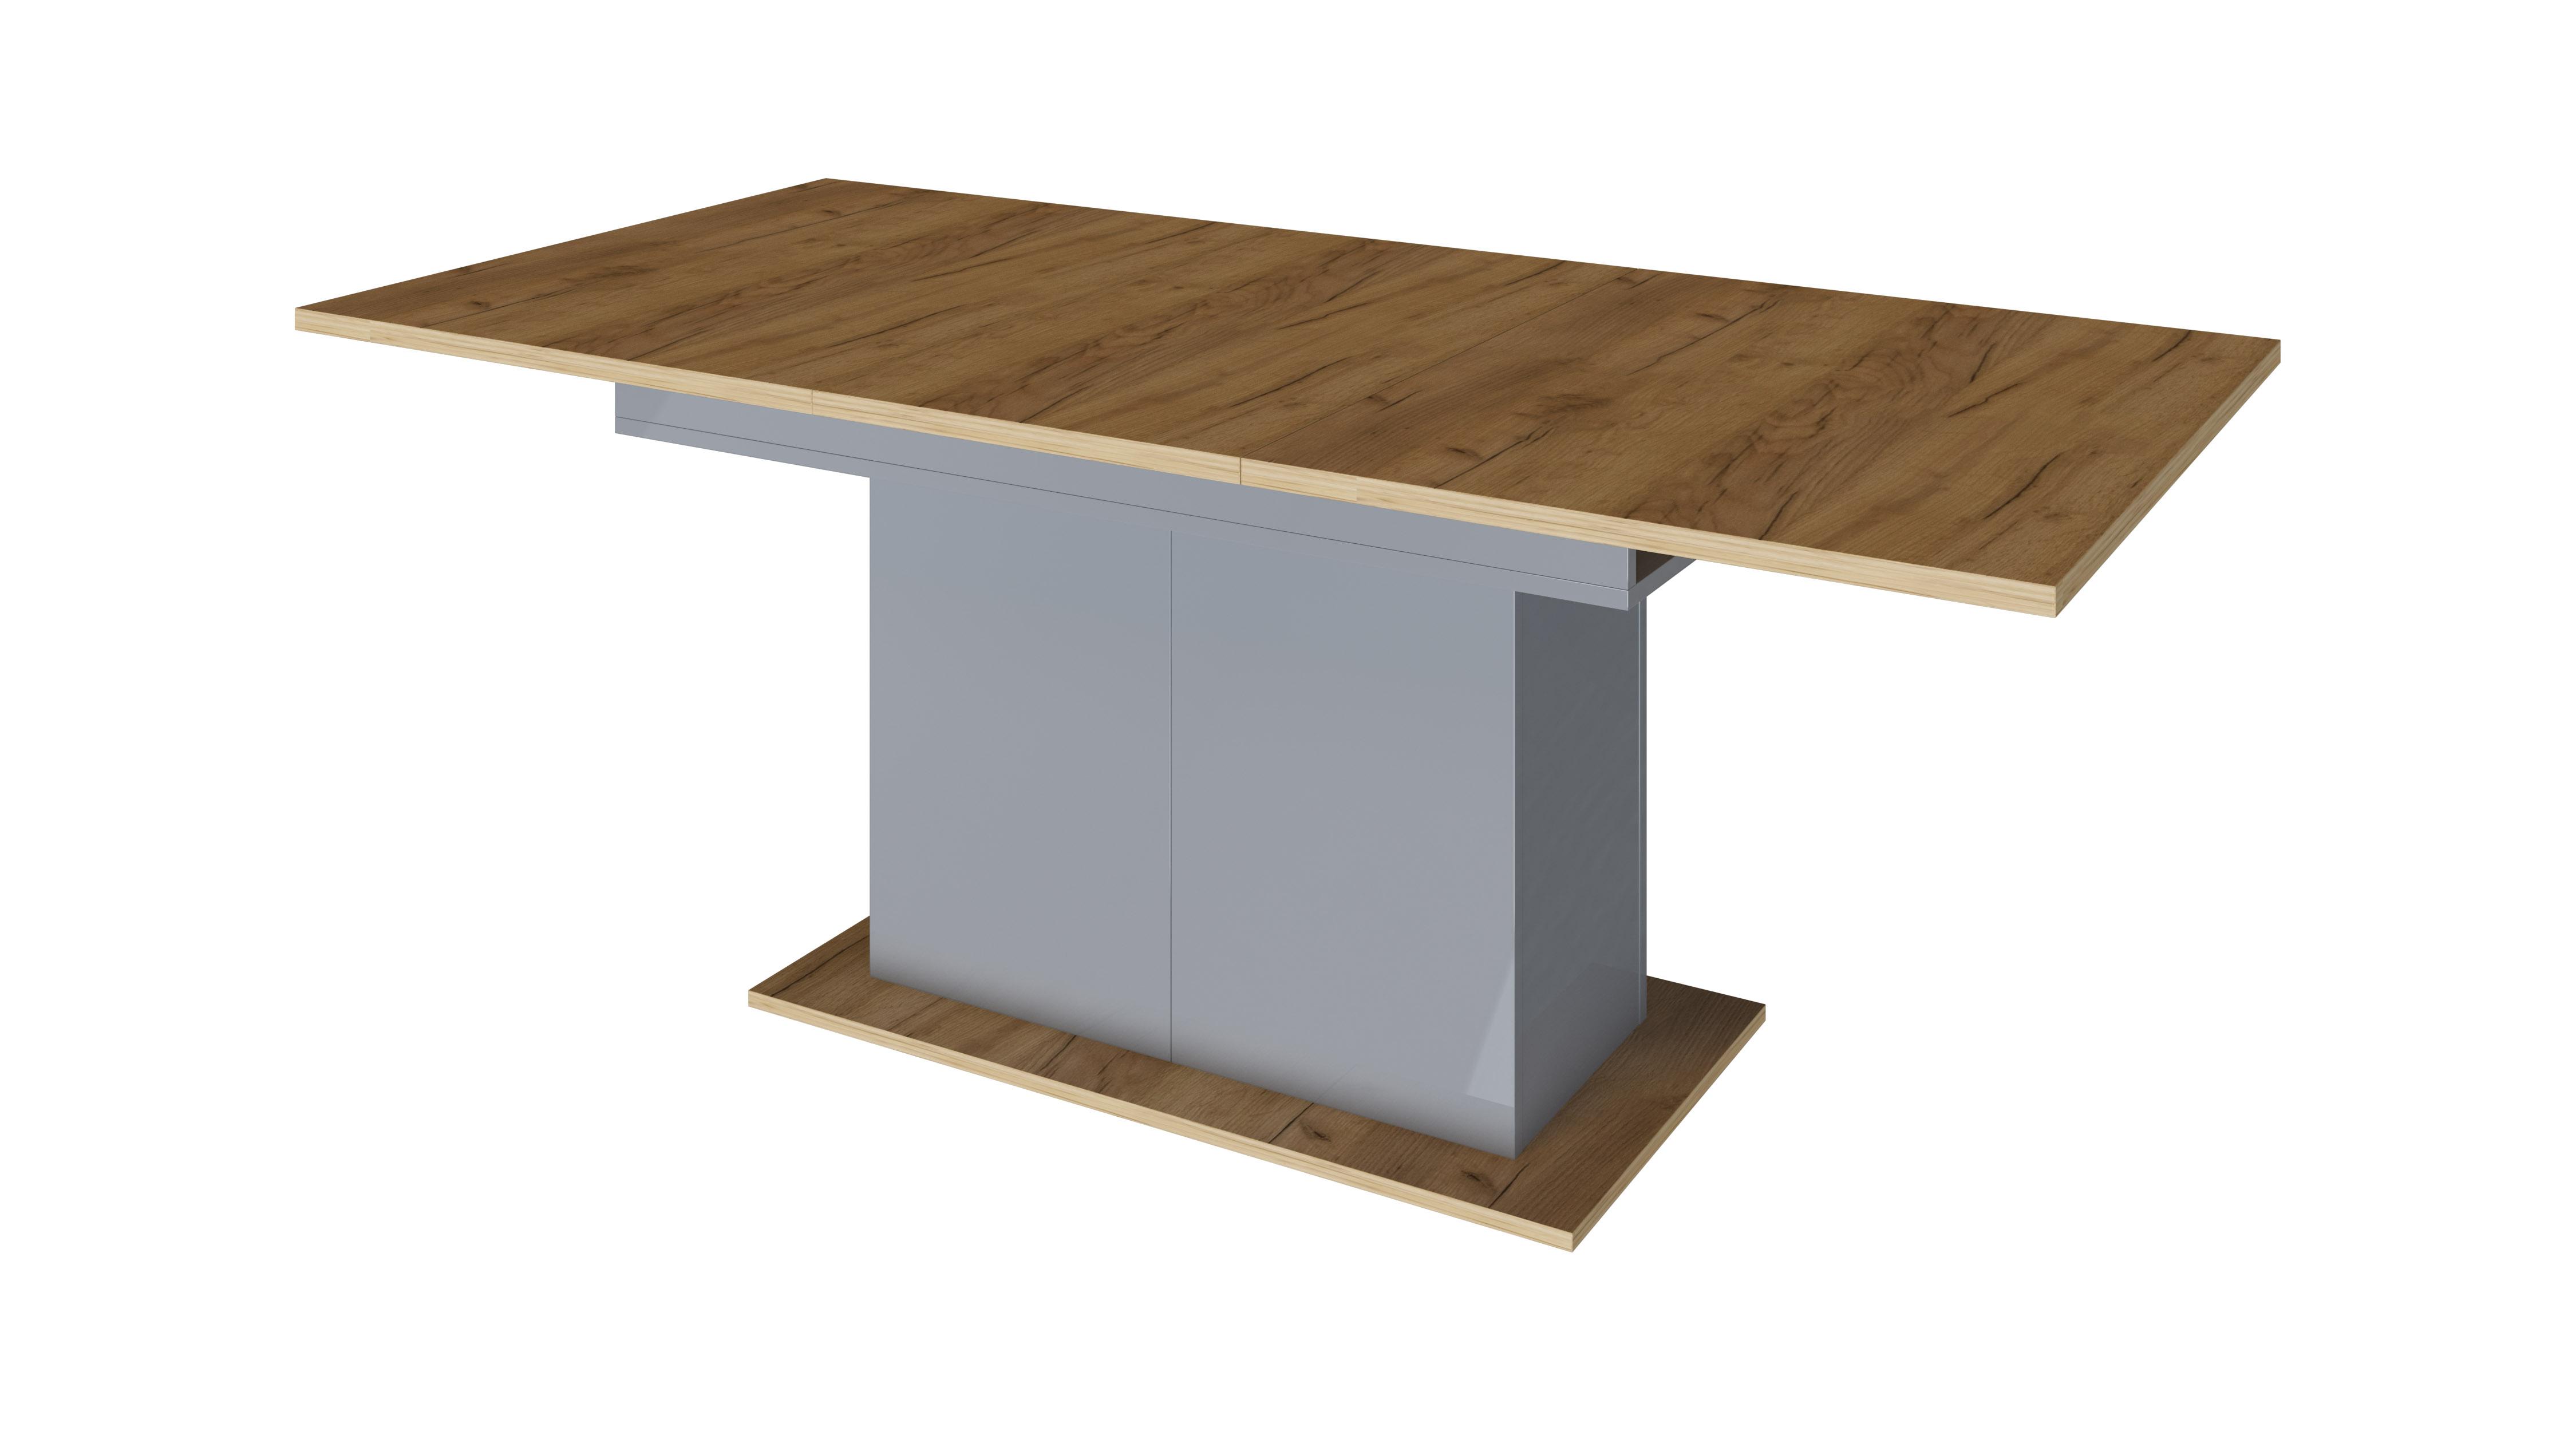 Стол обеденный дуб крафт/антрацит глянец - фото